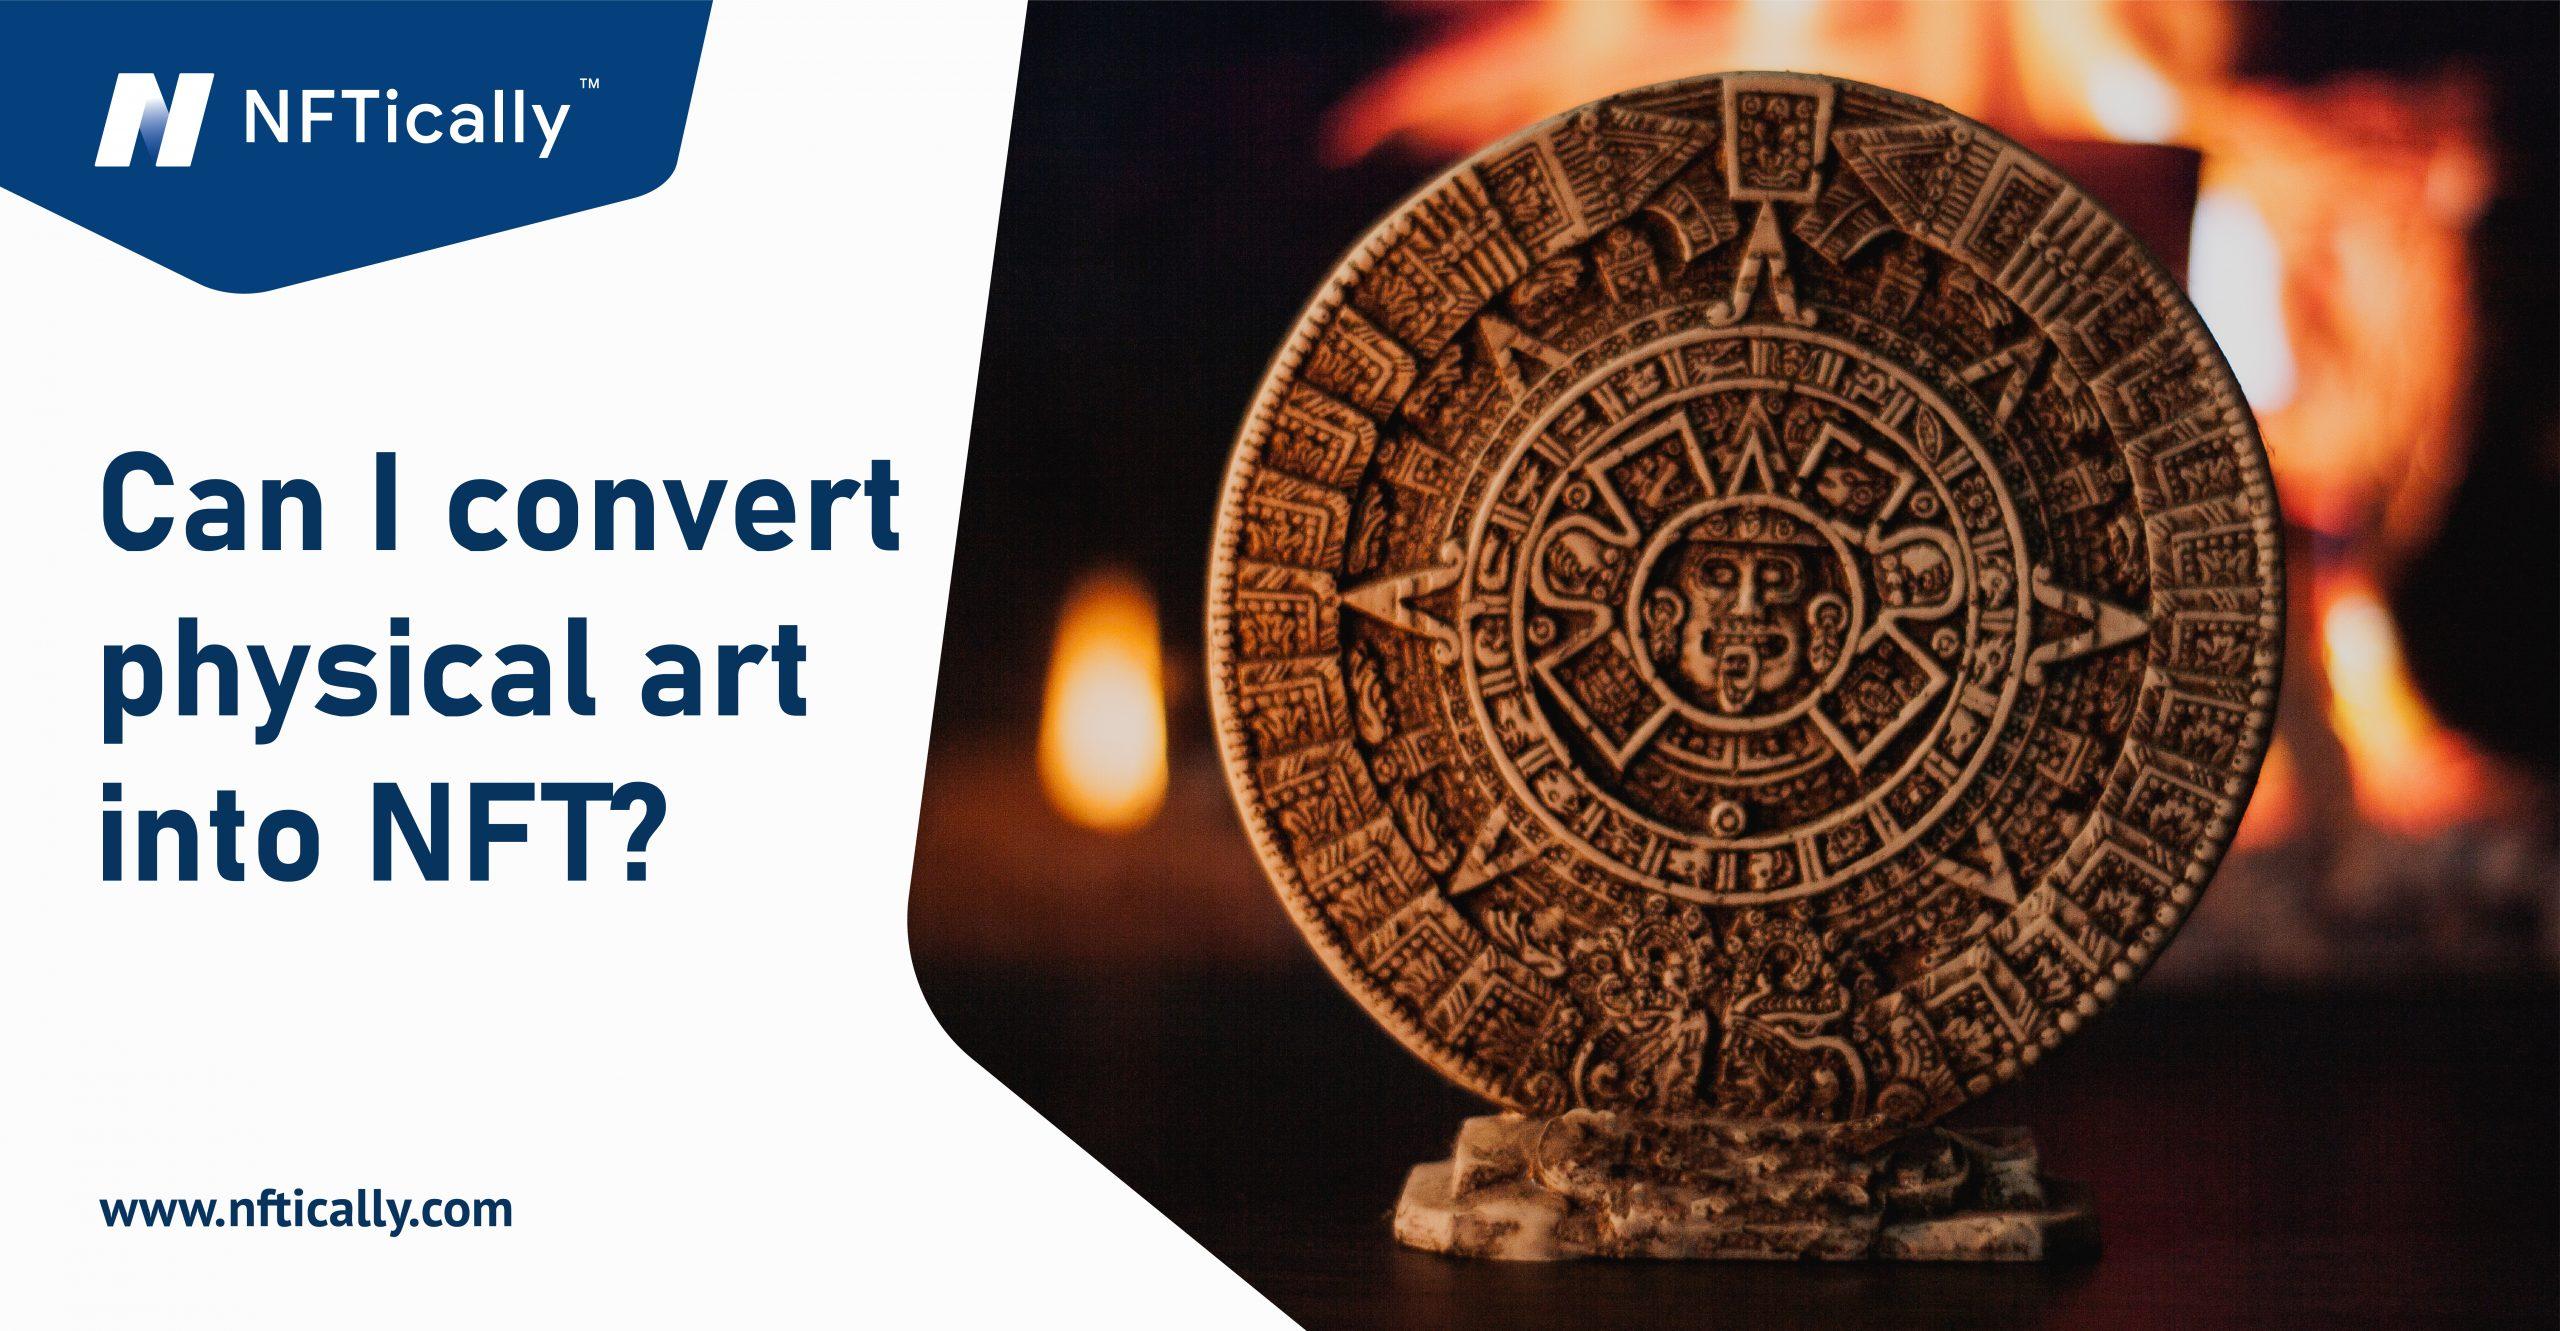 Can I convert physical art into NFT?